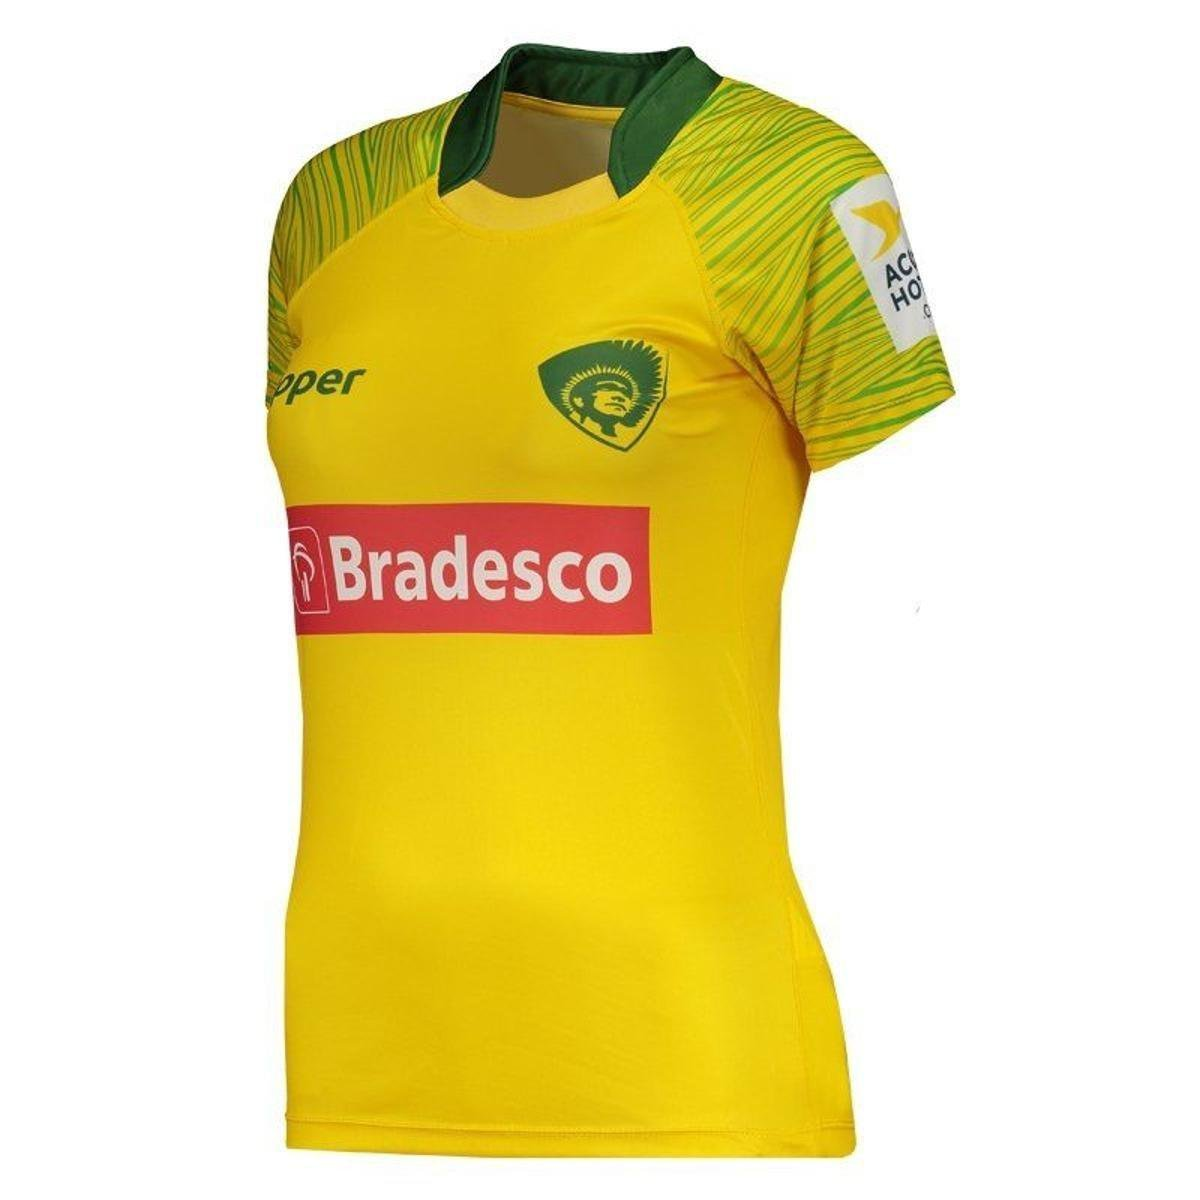 Feminina Home Amarelo 2017 Topper Camisa Rugby Camisa Home Brasil Topper Brasil Rugby 8gwqFv86WP